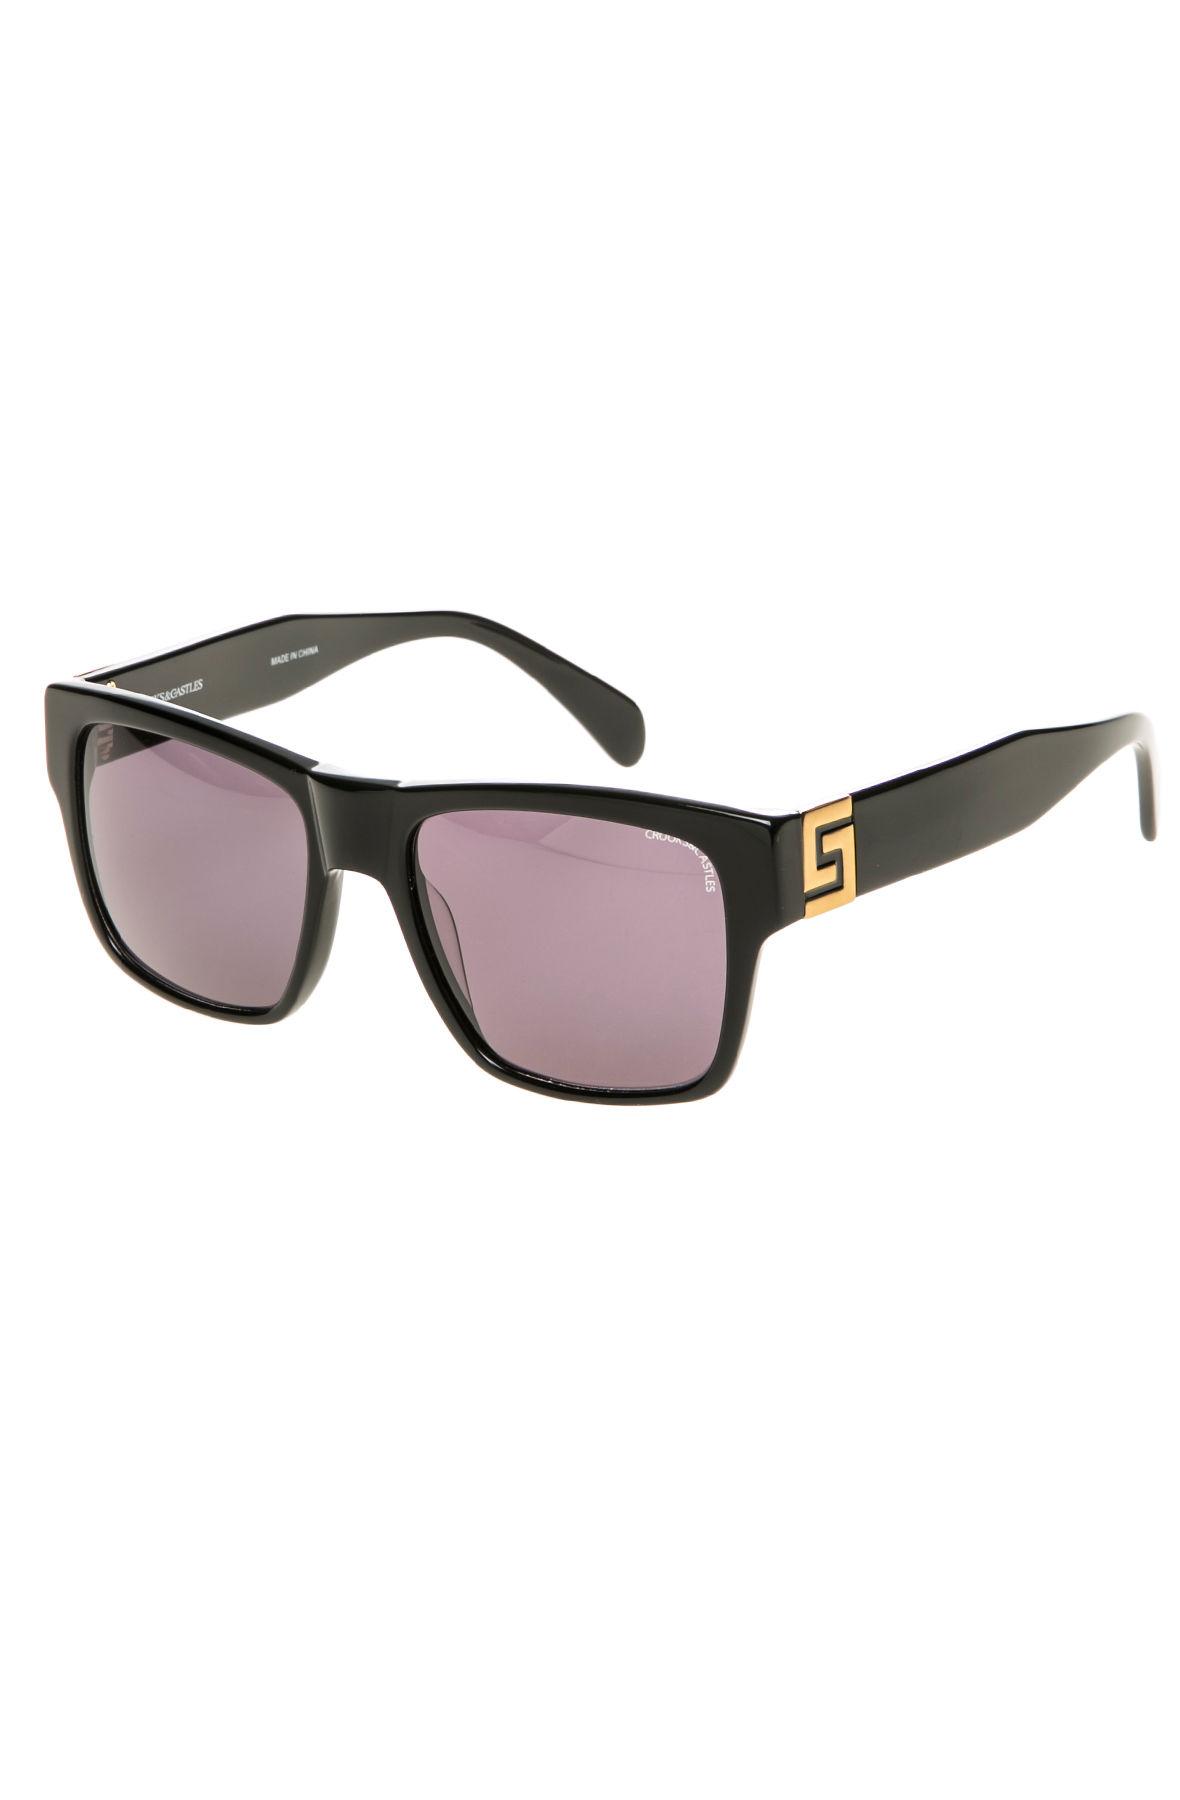 76409608cc774 Lyst - Crooks And Castles The Violento Noir Sunglasses in Black for Men